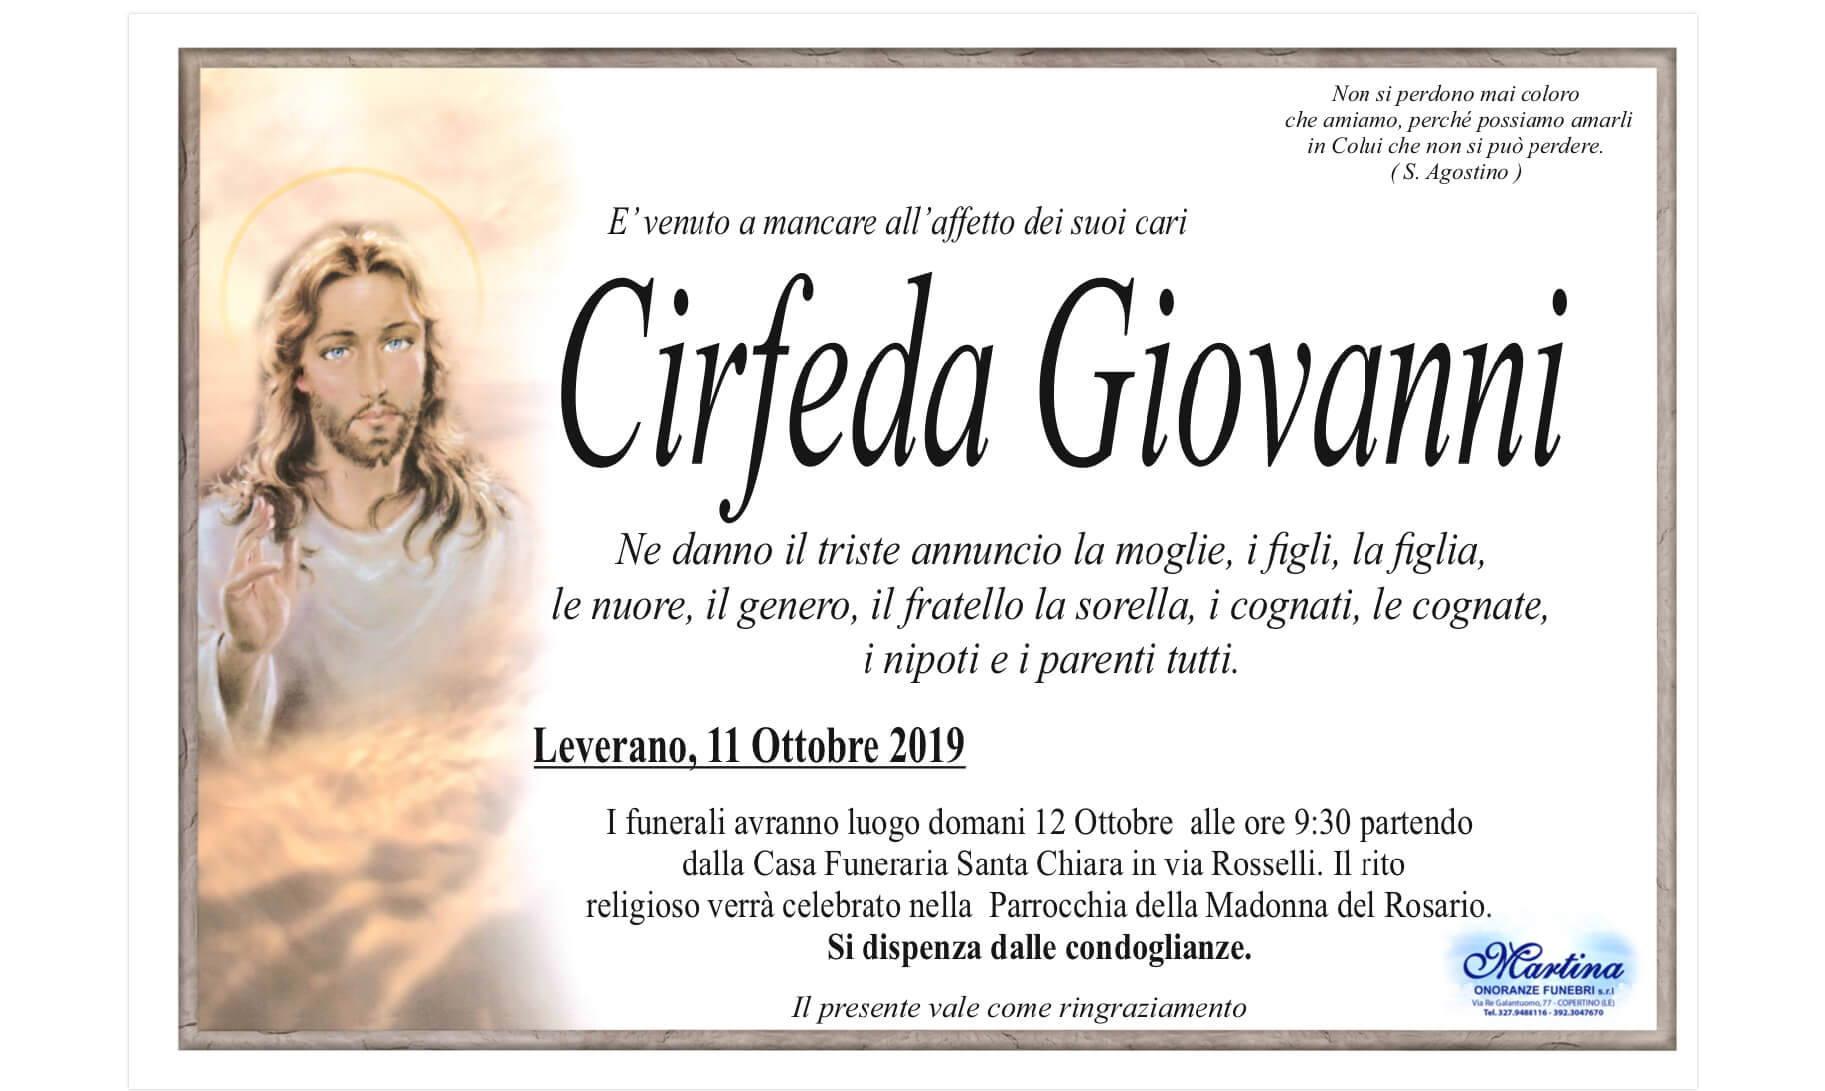 Giovanni Crifeda